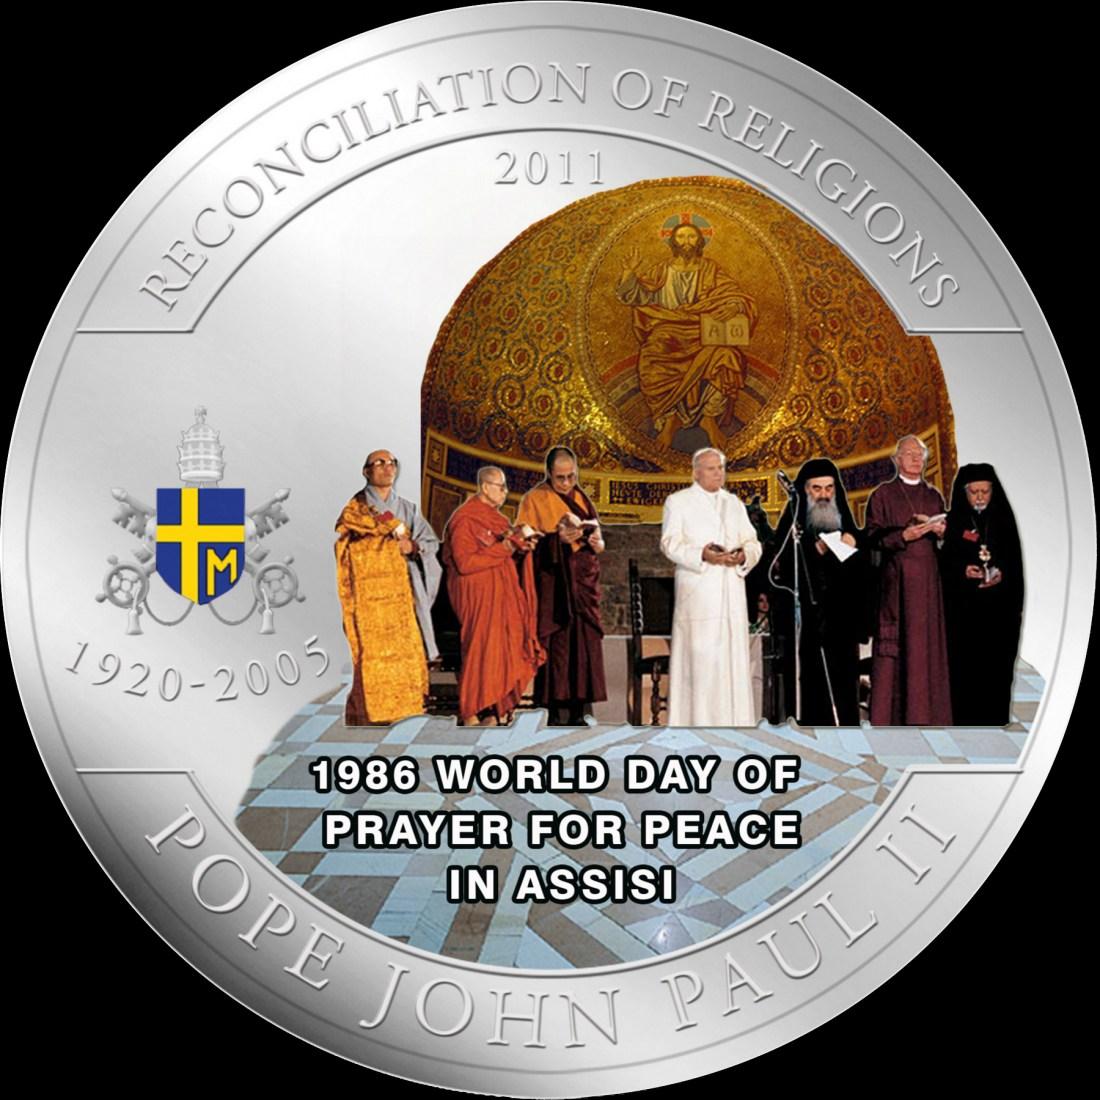 wereldgebedsdag_vrede (109)